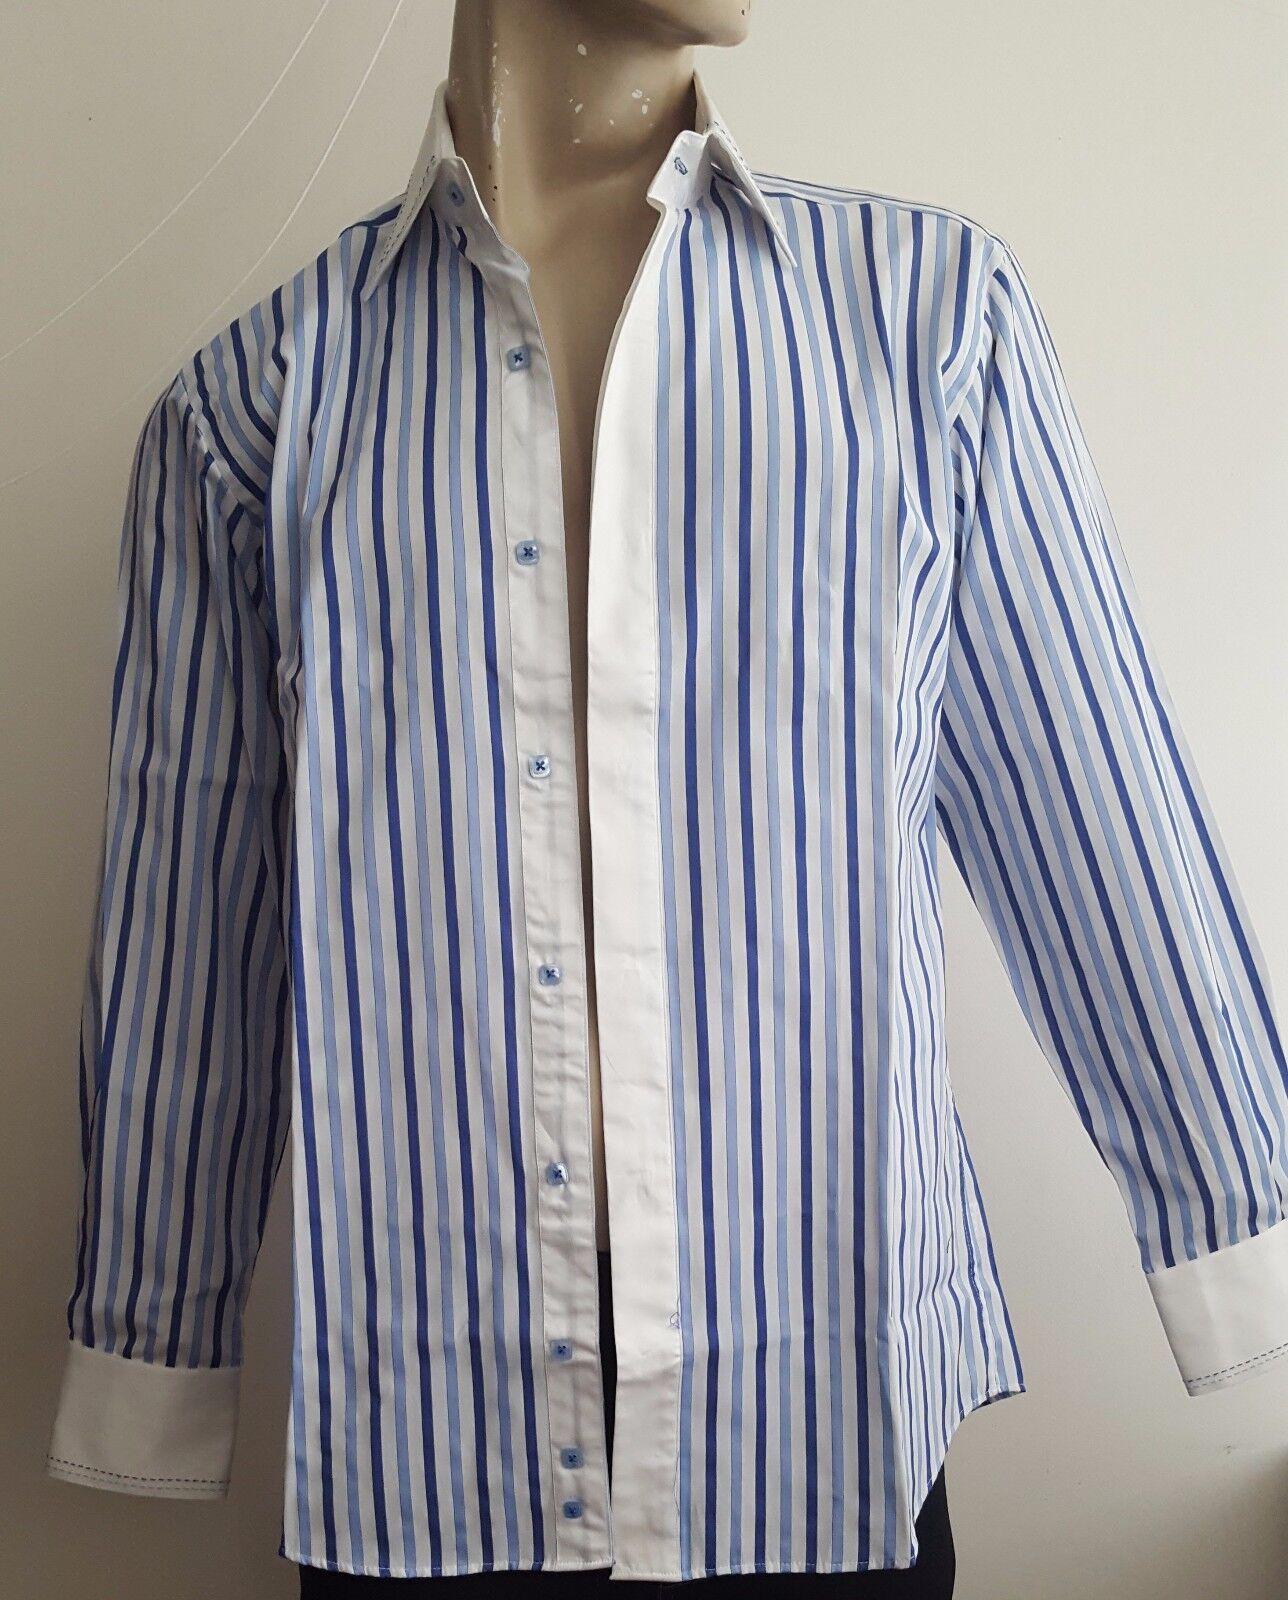 CLAUDIO LUGLI - Long Sleeve Shirt in Blau Stripe